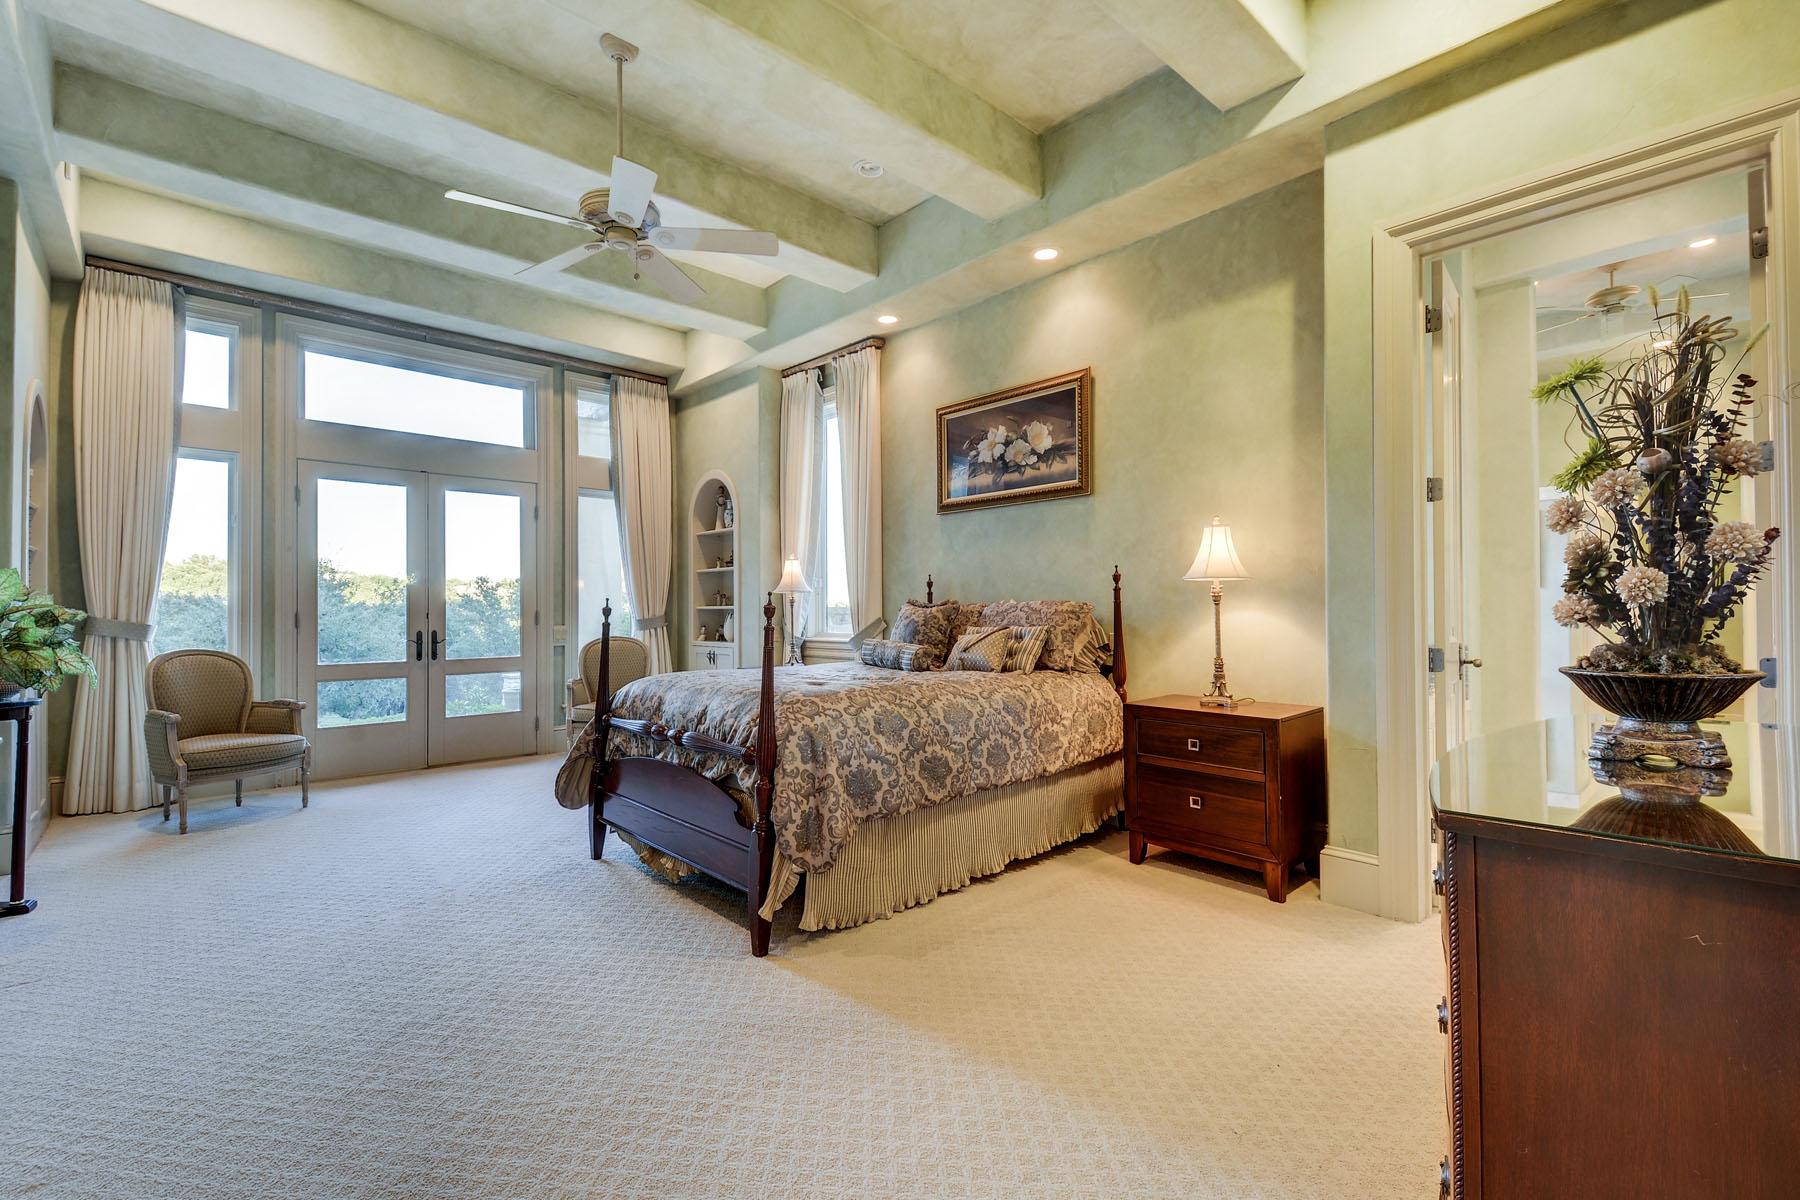 Additional photo for property listing at Sprawling Barton Creek Estate 8606 Navidad Dr Austin, Texas 78735 Estados Unidos